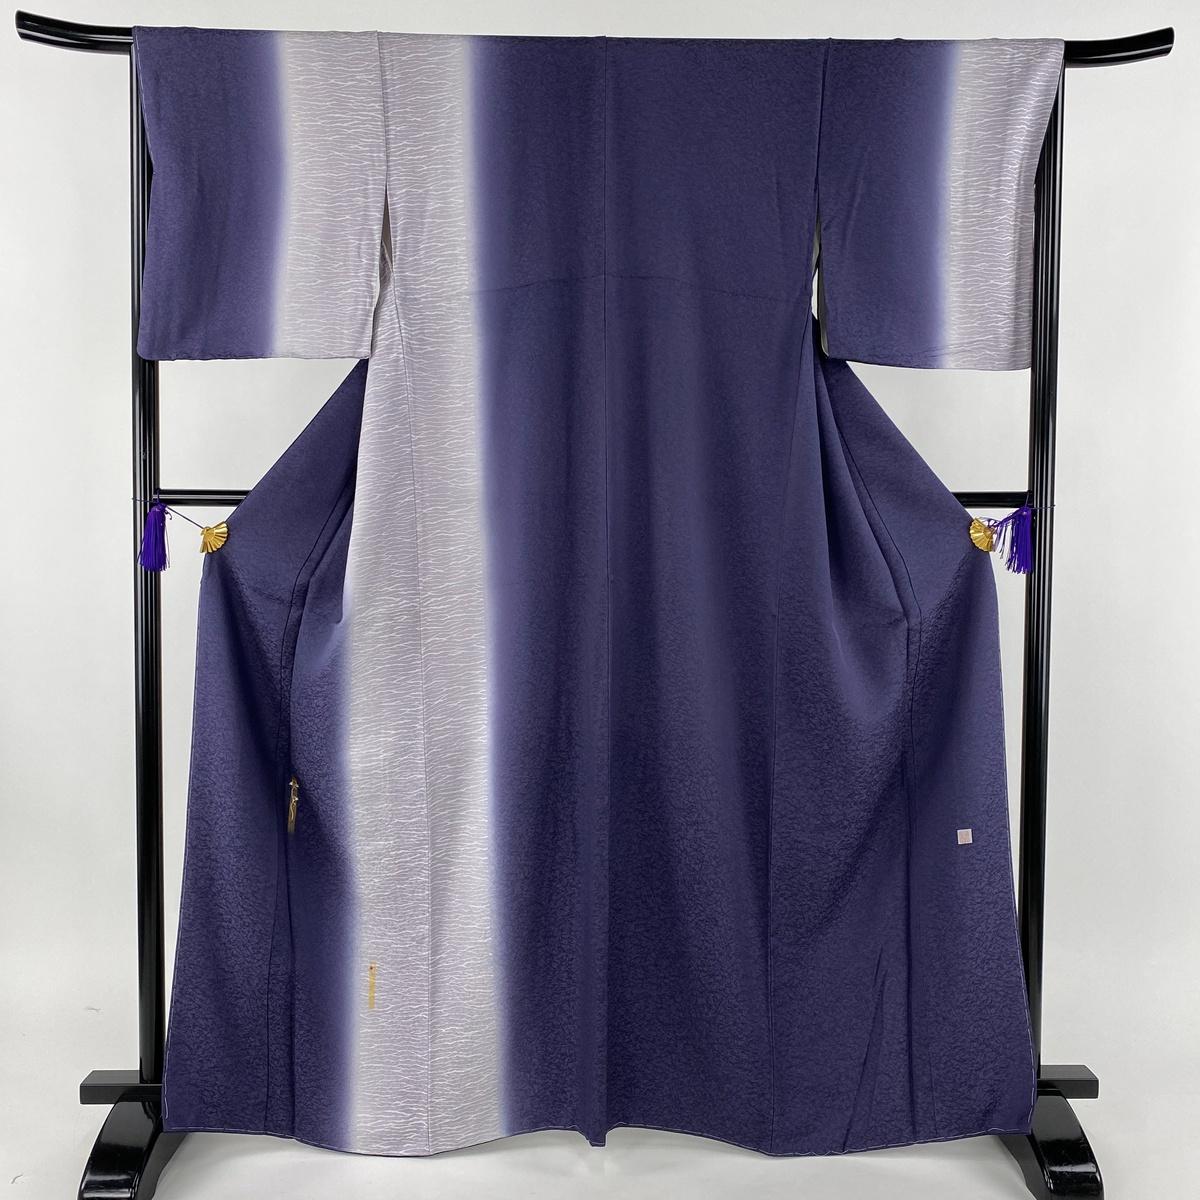 付下げ 美品 名品 落款あり 草花 刺繍 金糸 紫 袷 身丈166cm 裄丈66cm M 正絹 【中古】